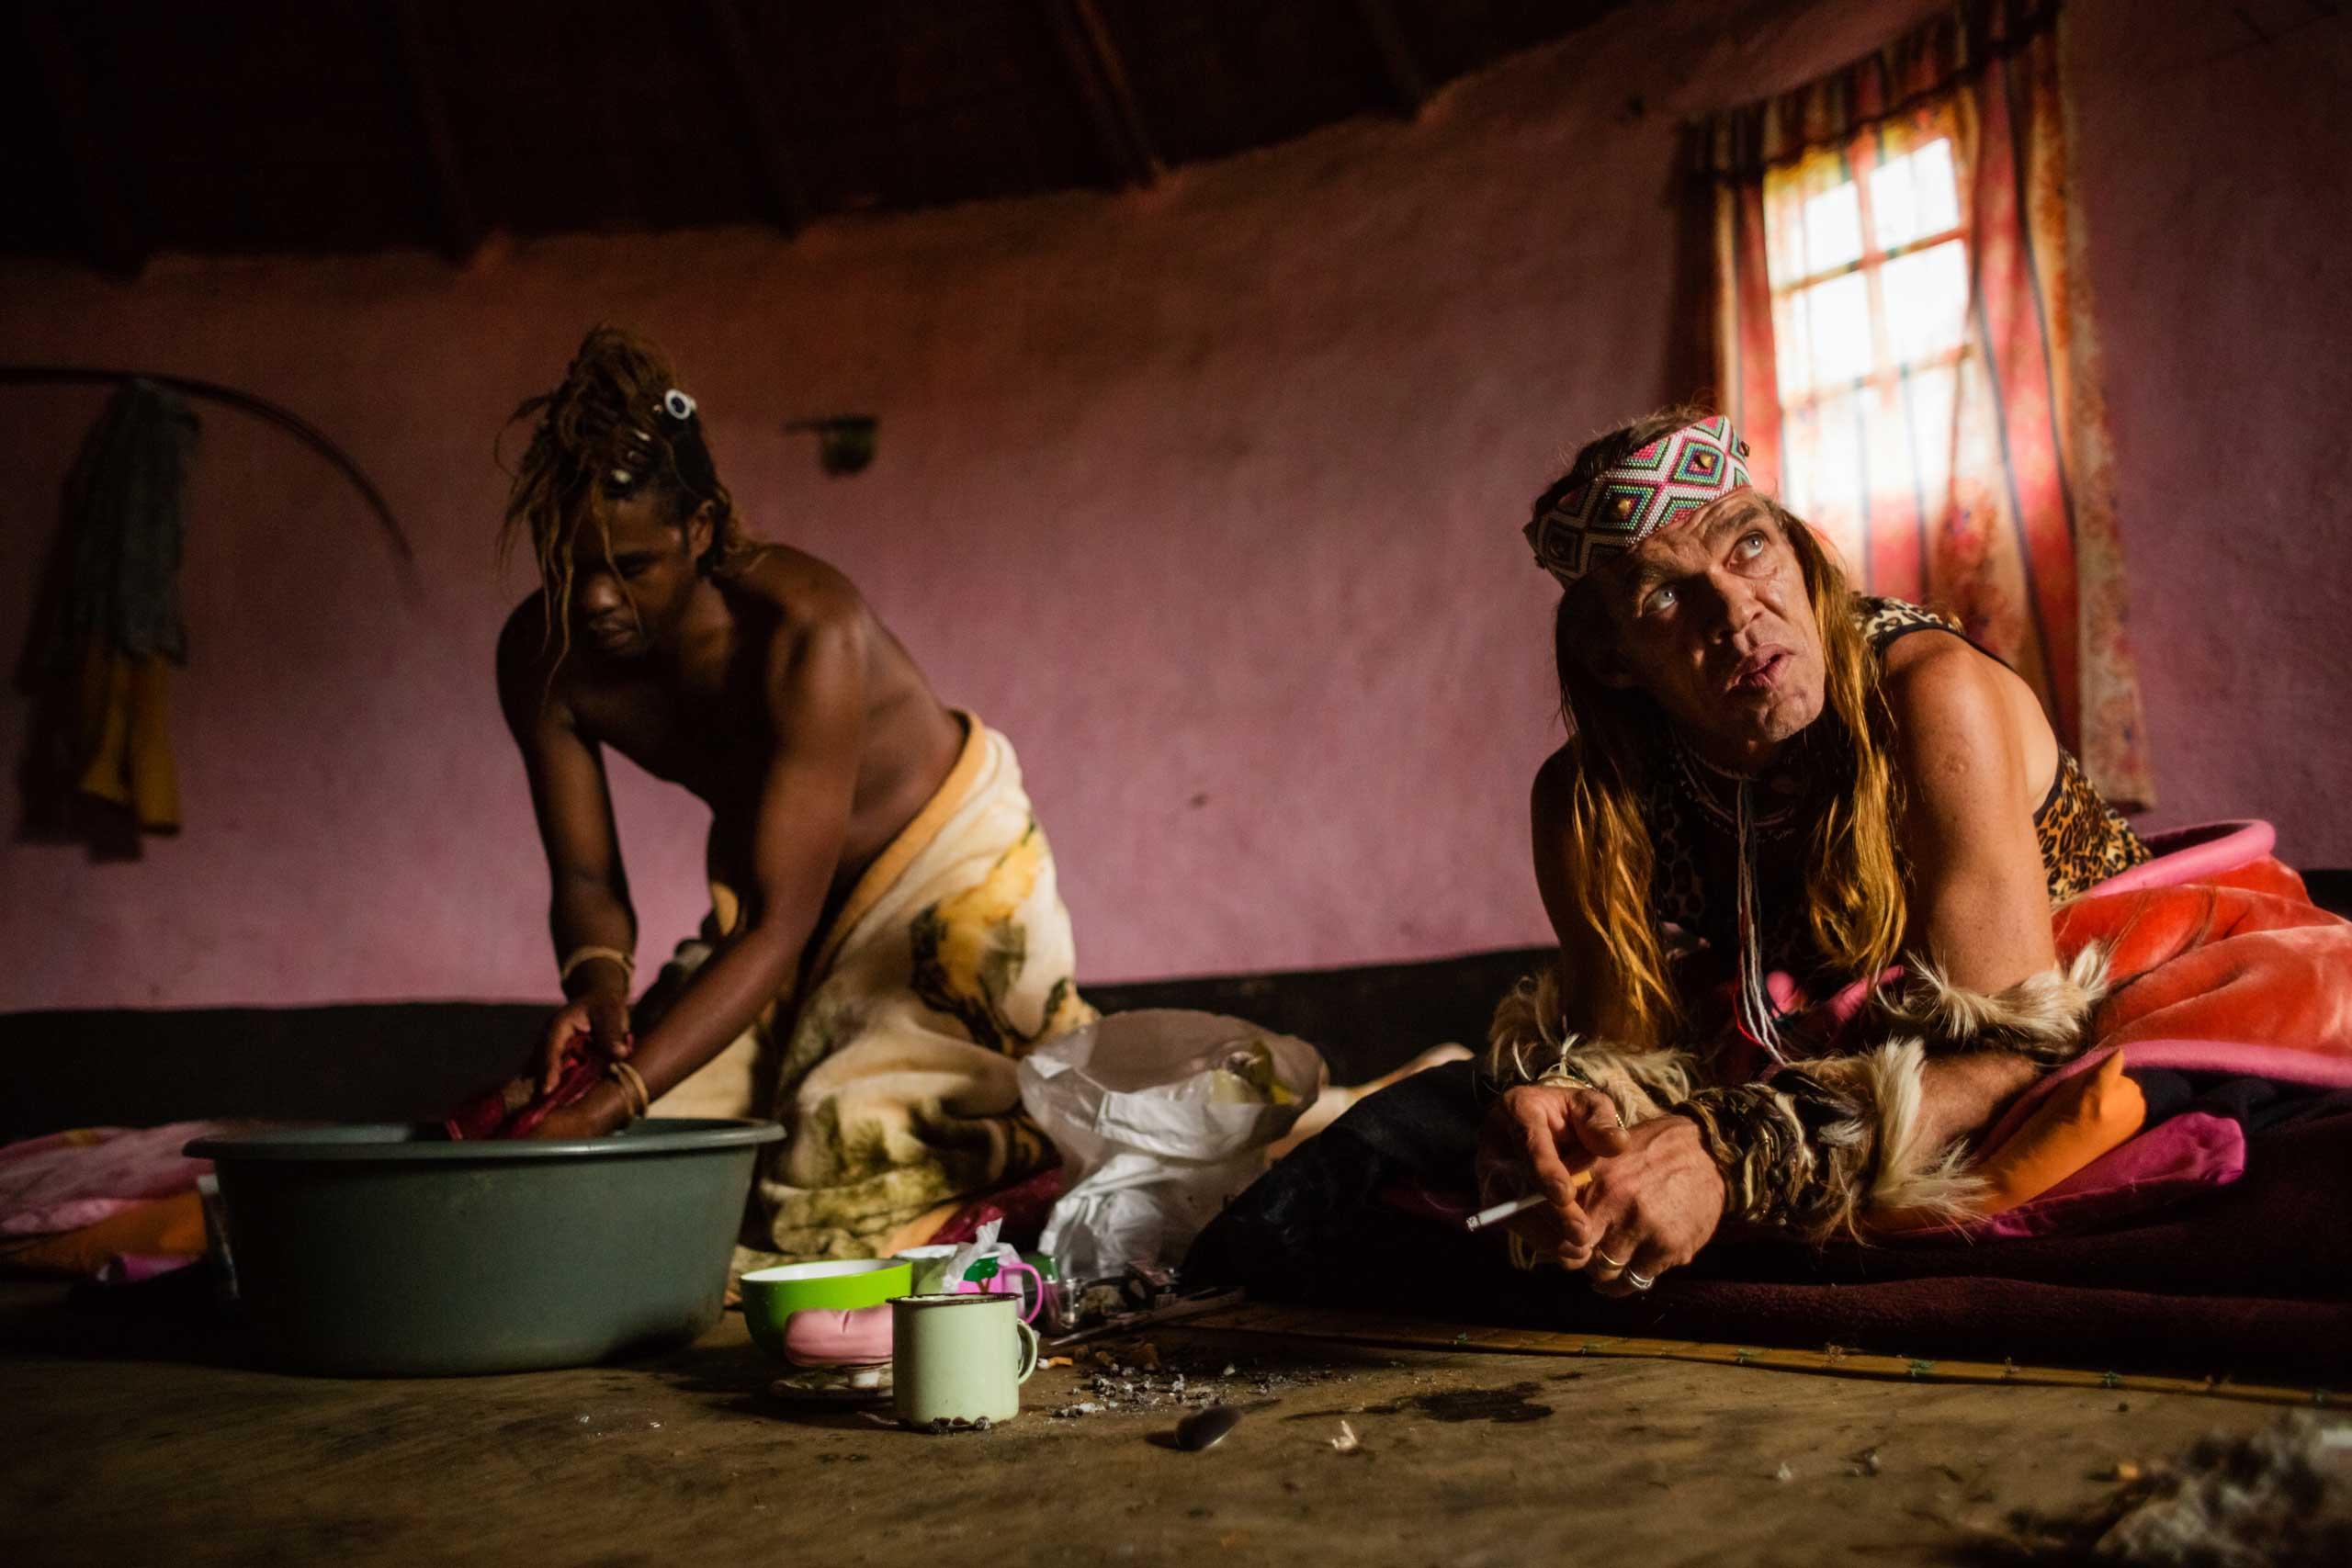 Sangoma Chris Ntombemhlophe Reid smokes a cigarette on his bed at his spiritual family's homestead while sangoma Ntombethongo washes himself on Nov. 13, 2014 in Umzizwanga, Lusikisiki District, South Africa.